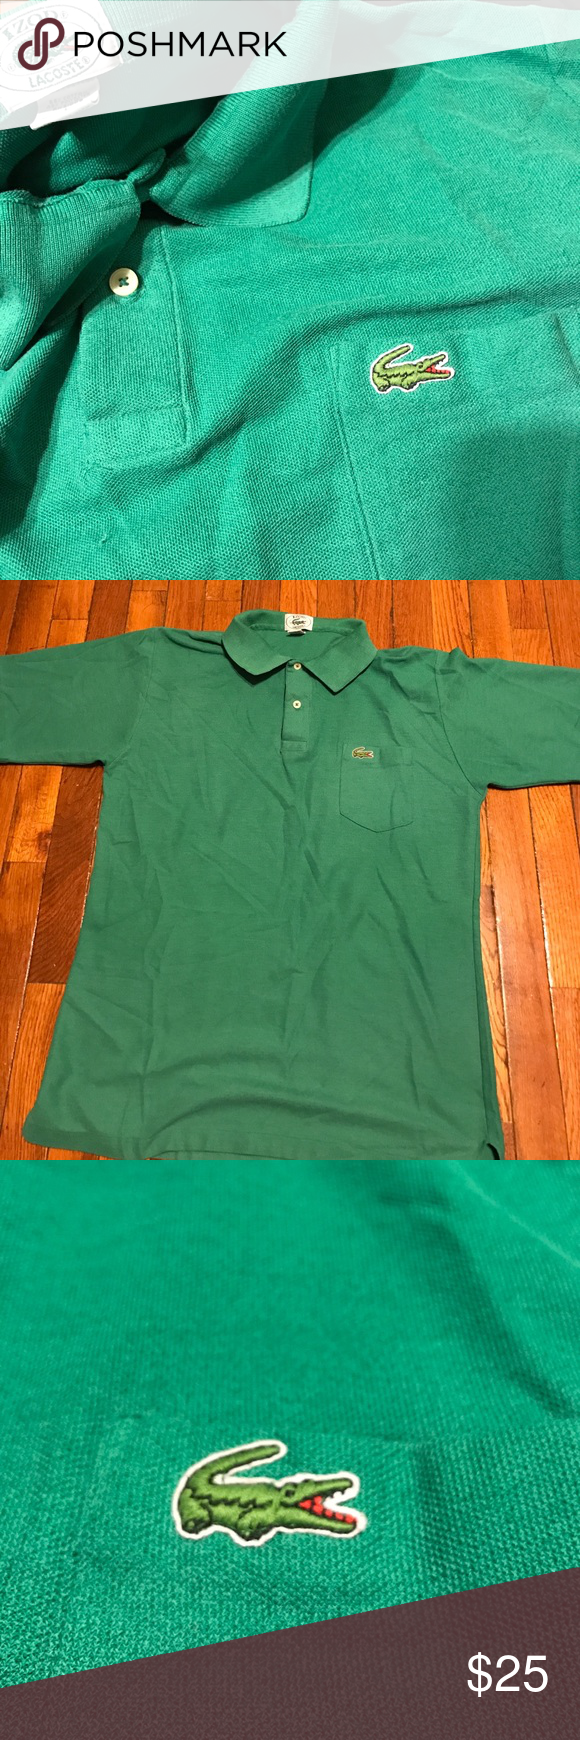 ef1300656b8 Rare Vintage Izod Lacoste polo shirt Vintage Lacoste Lacoste Shirts Polos